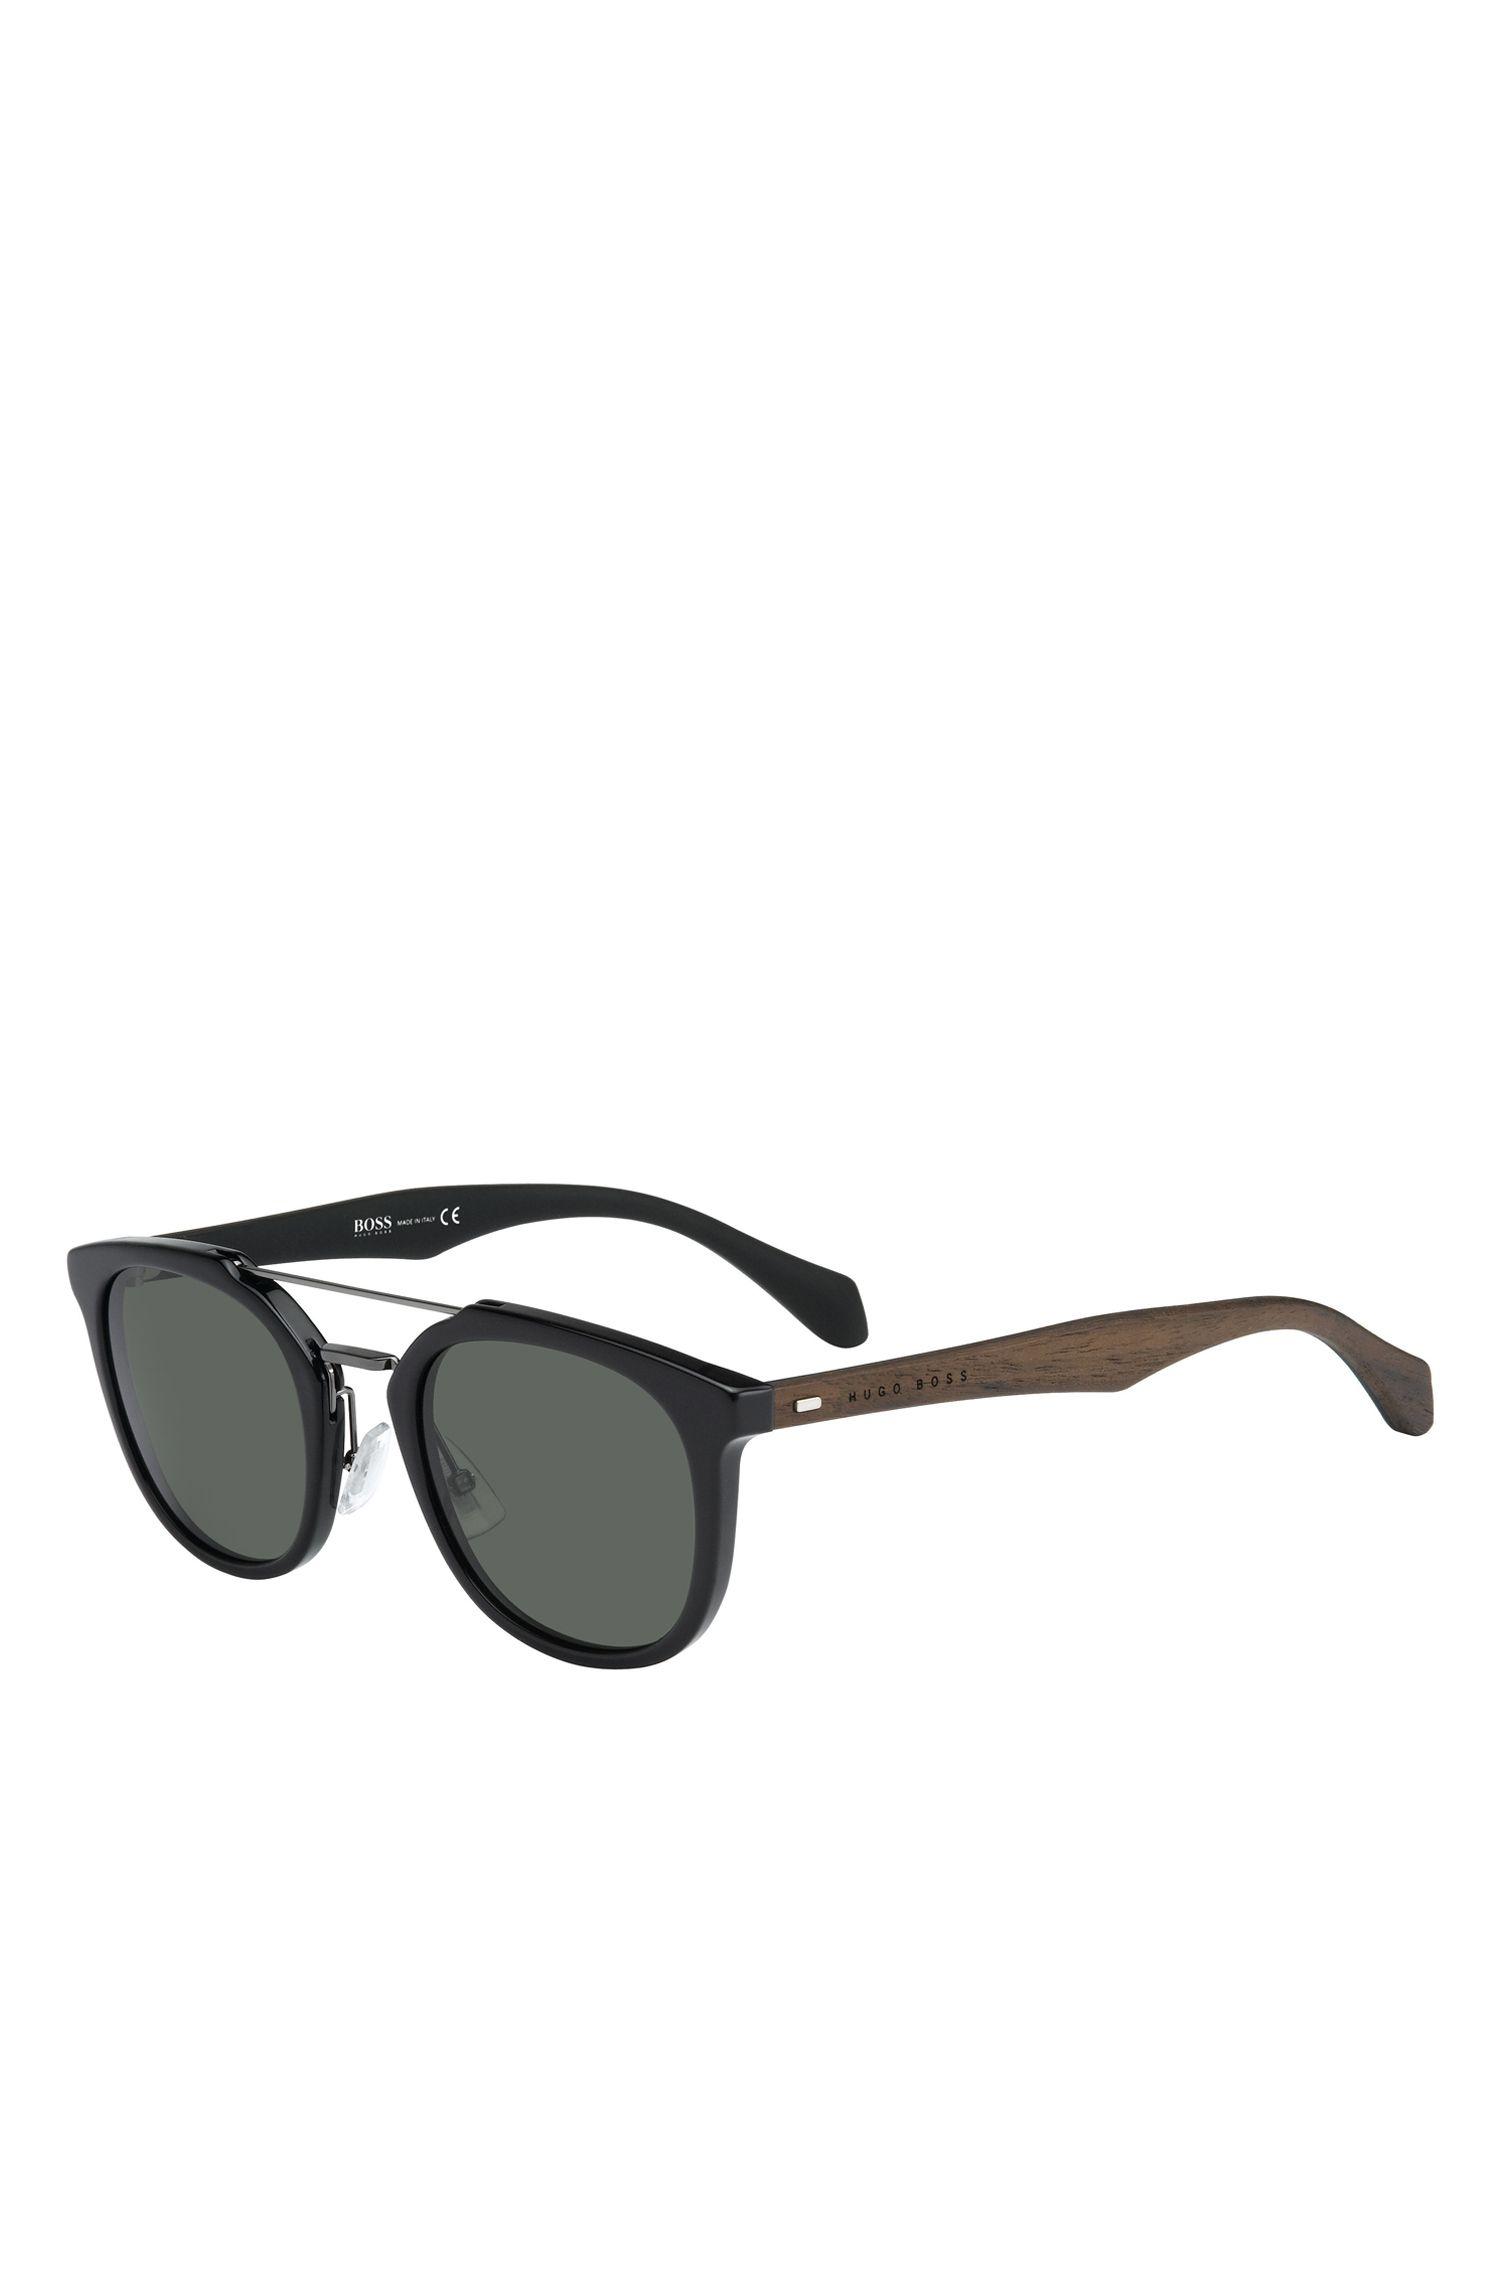 'BOSS 0777S' | Gray Green Lens Clubmaster Sunglasses